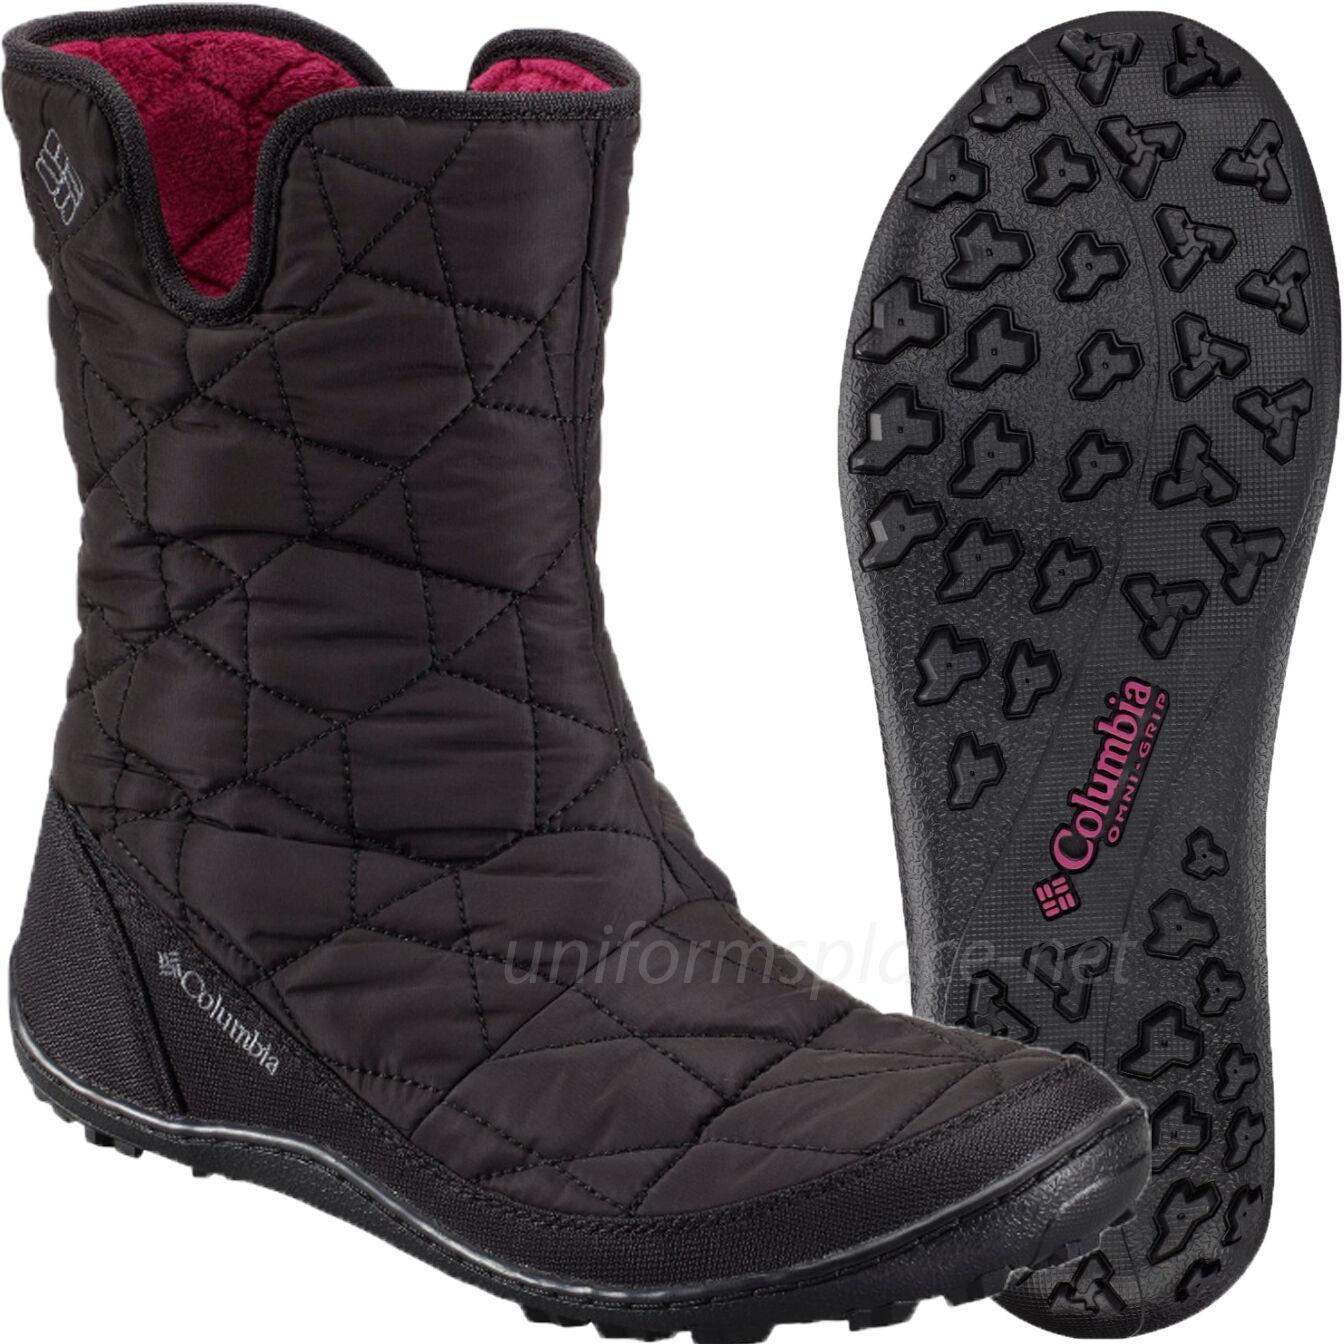 Columbia II Stiefel Damenschuhe Minx Slip II Columbia Omni-Heat Pull-on Waterproof Boot Insulation 3735d2